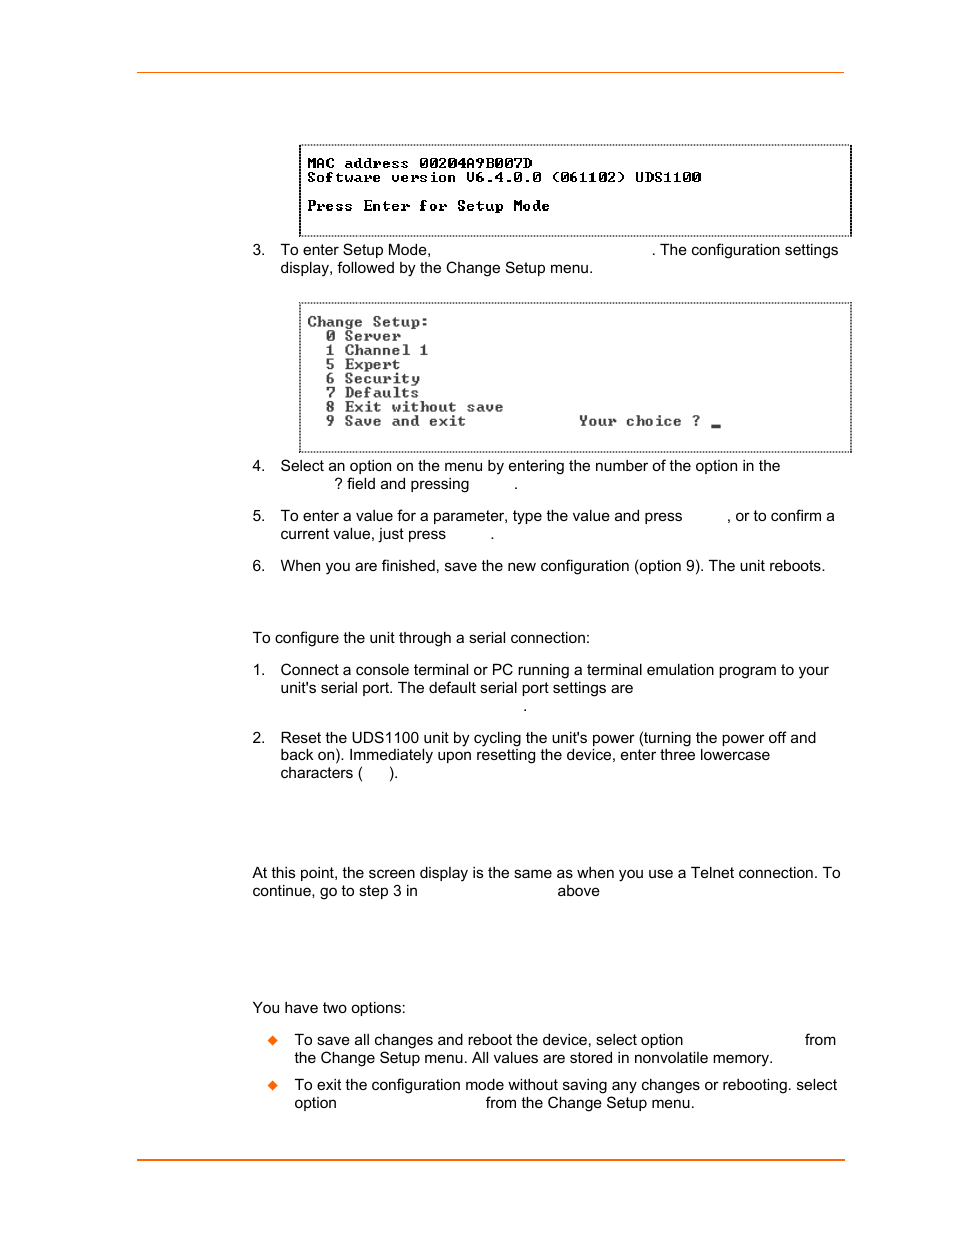 Exiting setup mode, Serial port connection, Figure 5-1  mac